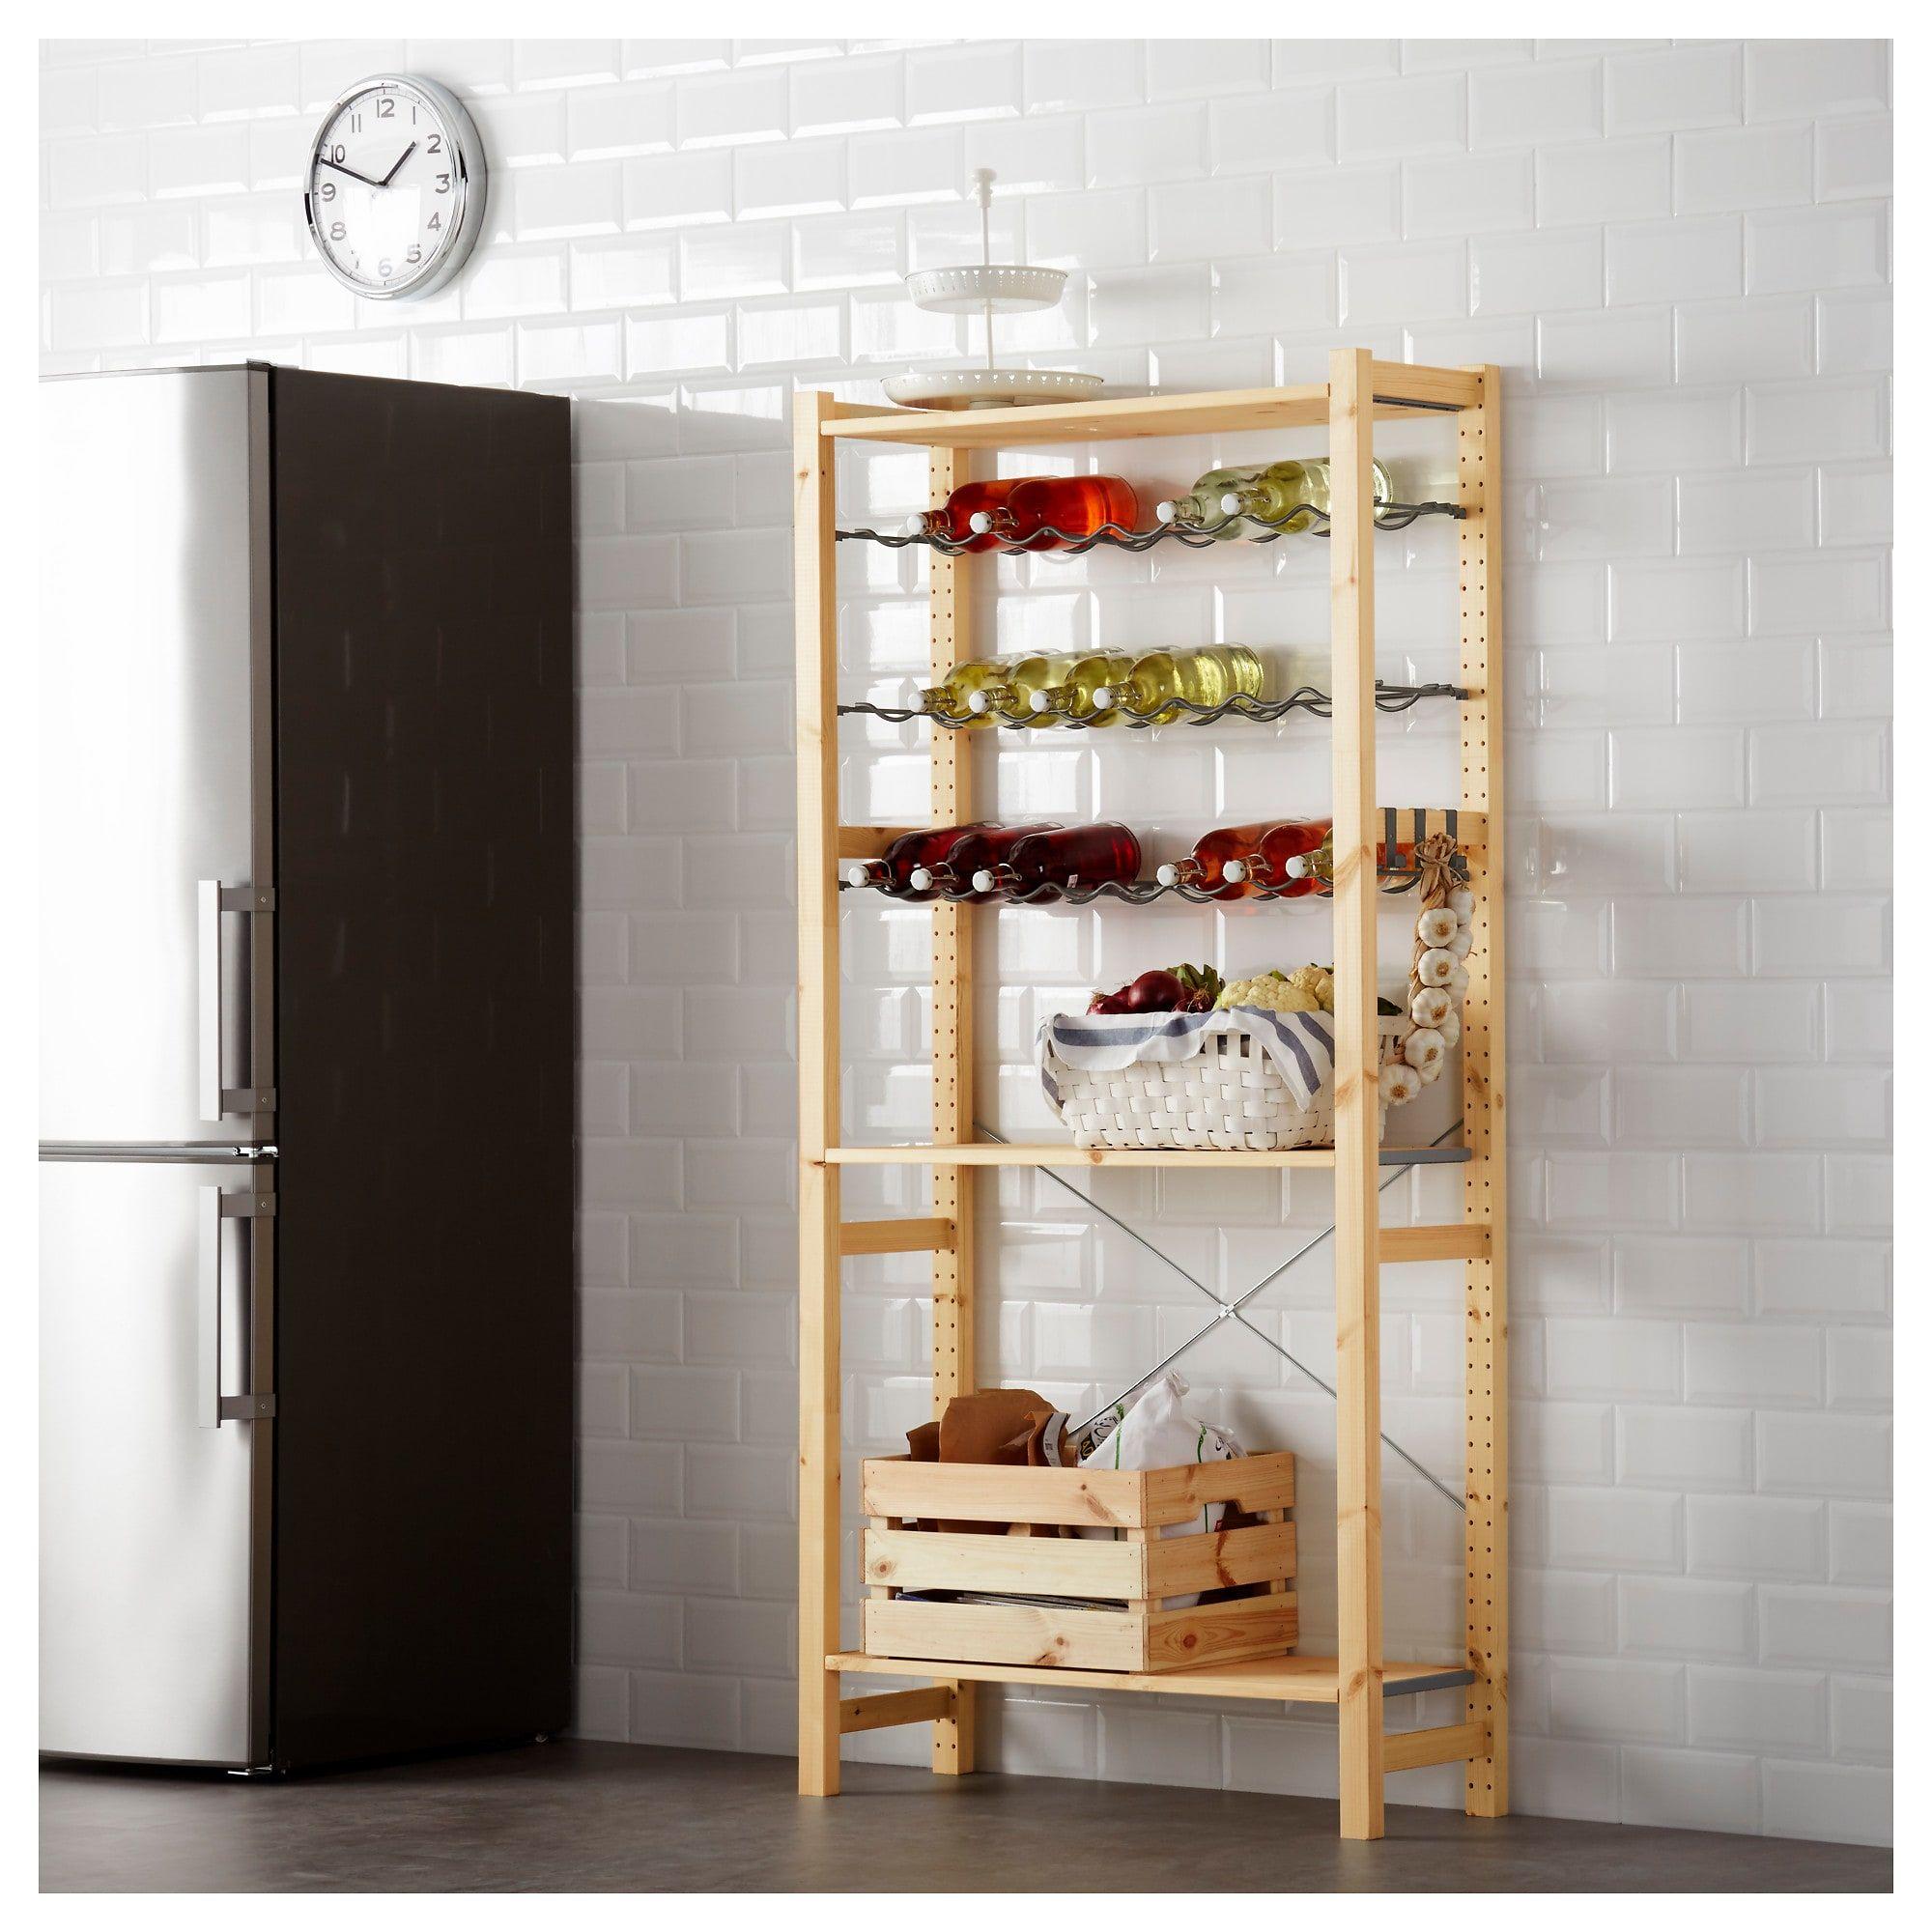 Us Furniture And Home Furnishings Shelves Ikea Ivar Shelving Unit